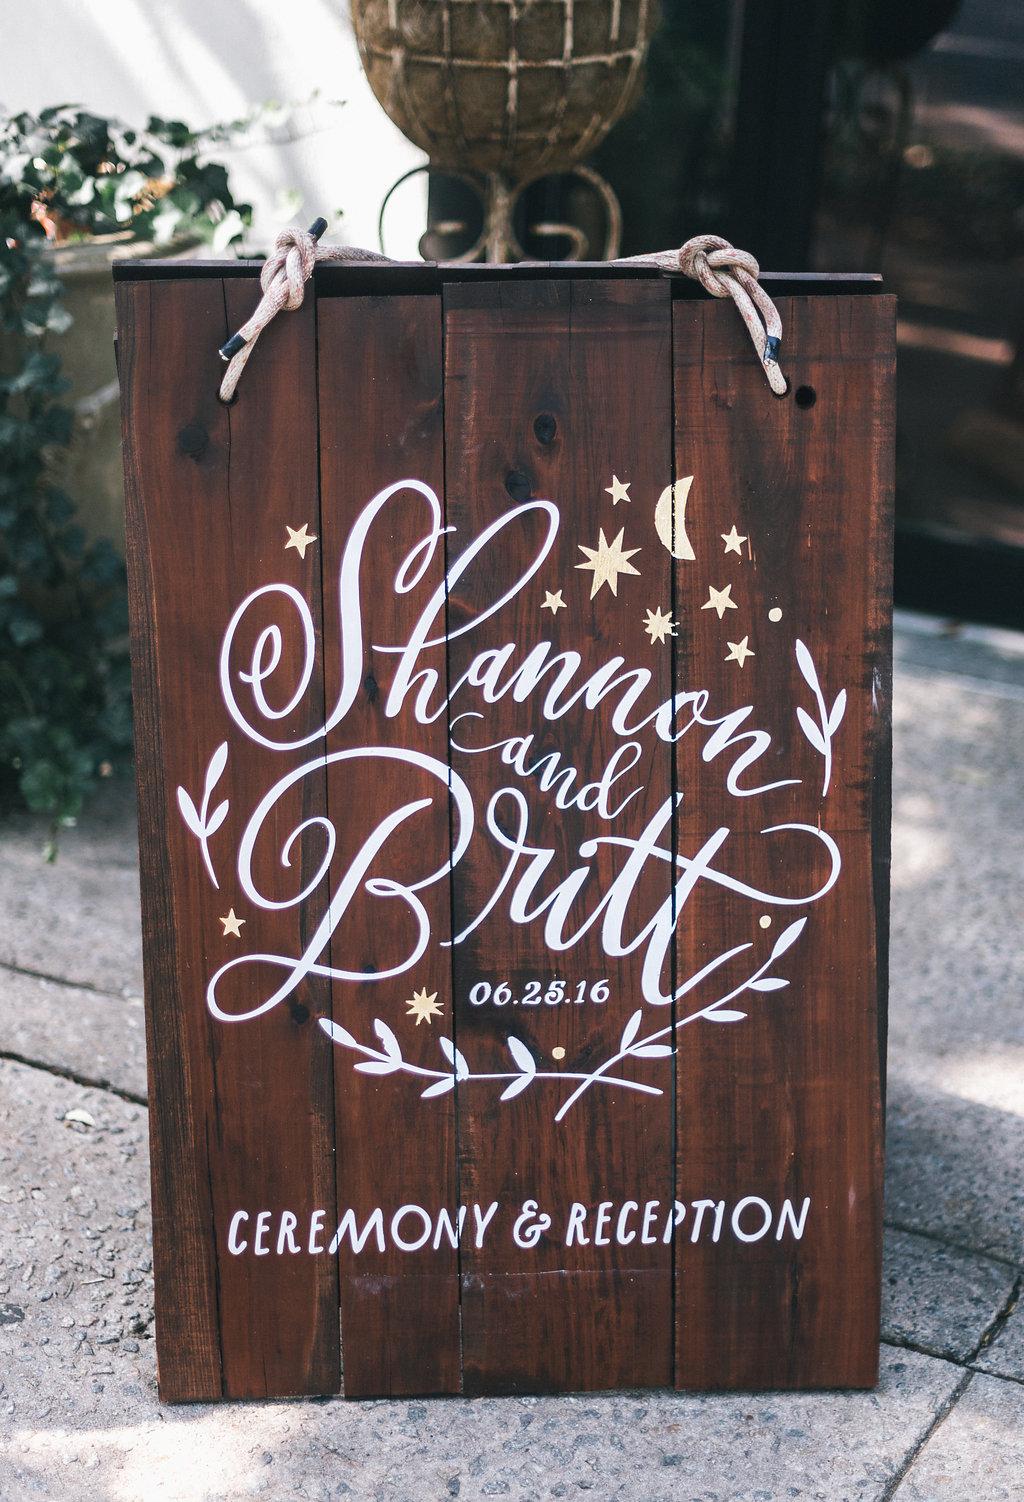 shannon-britt-mackensey-alexander-photography-green-wedding-shoes-ivory-and-beau-bridal-boutique-savannah-wedding-planner-savannah-bridal-boutique-savannah-wedding-dresses-savannah-florist-summer-solstice-wedding-boho-soho-south-cafe-wedding-37.jpg